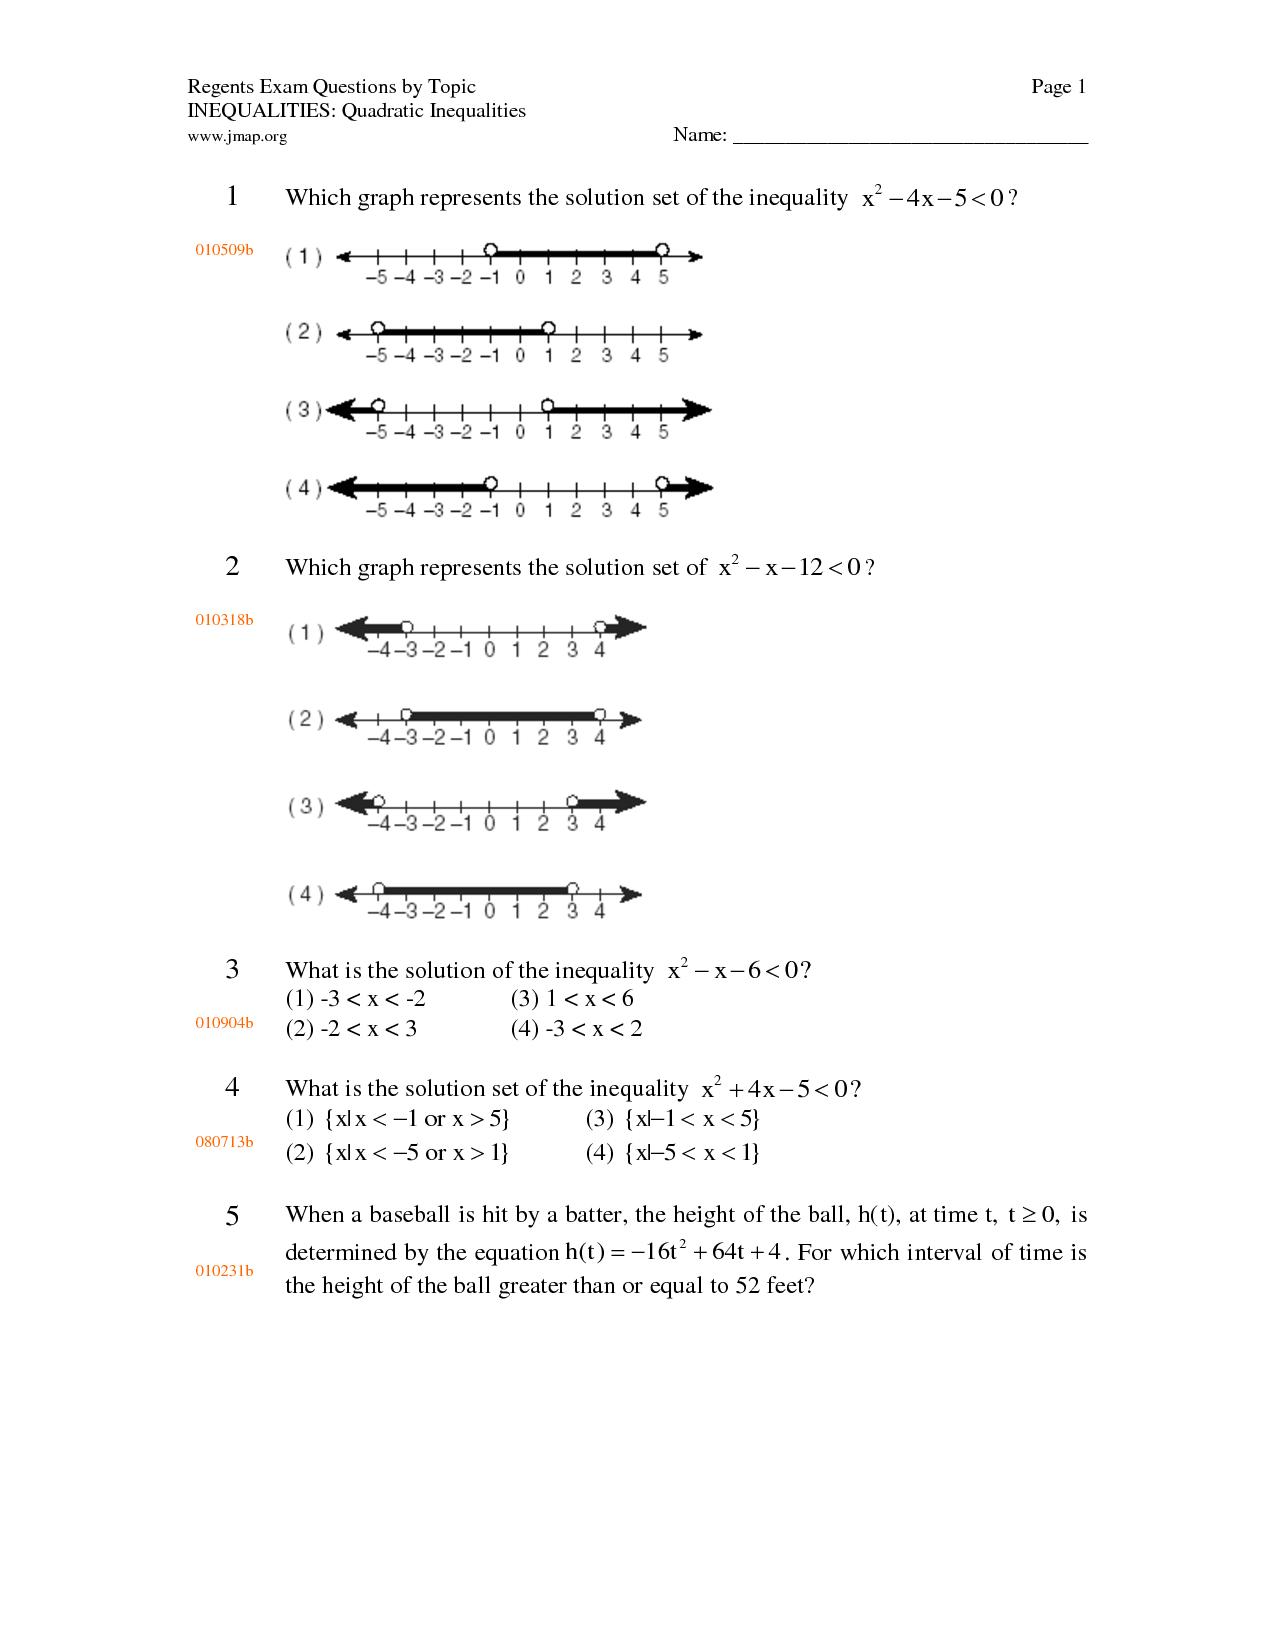 Worksheet Quadratic Inequalities